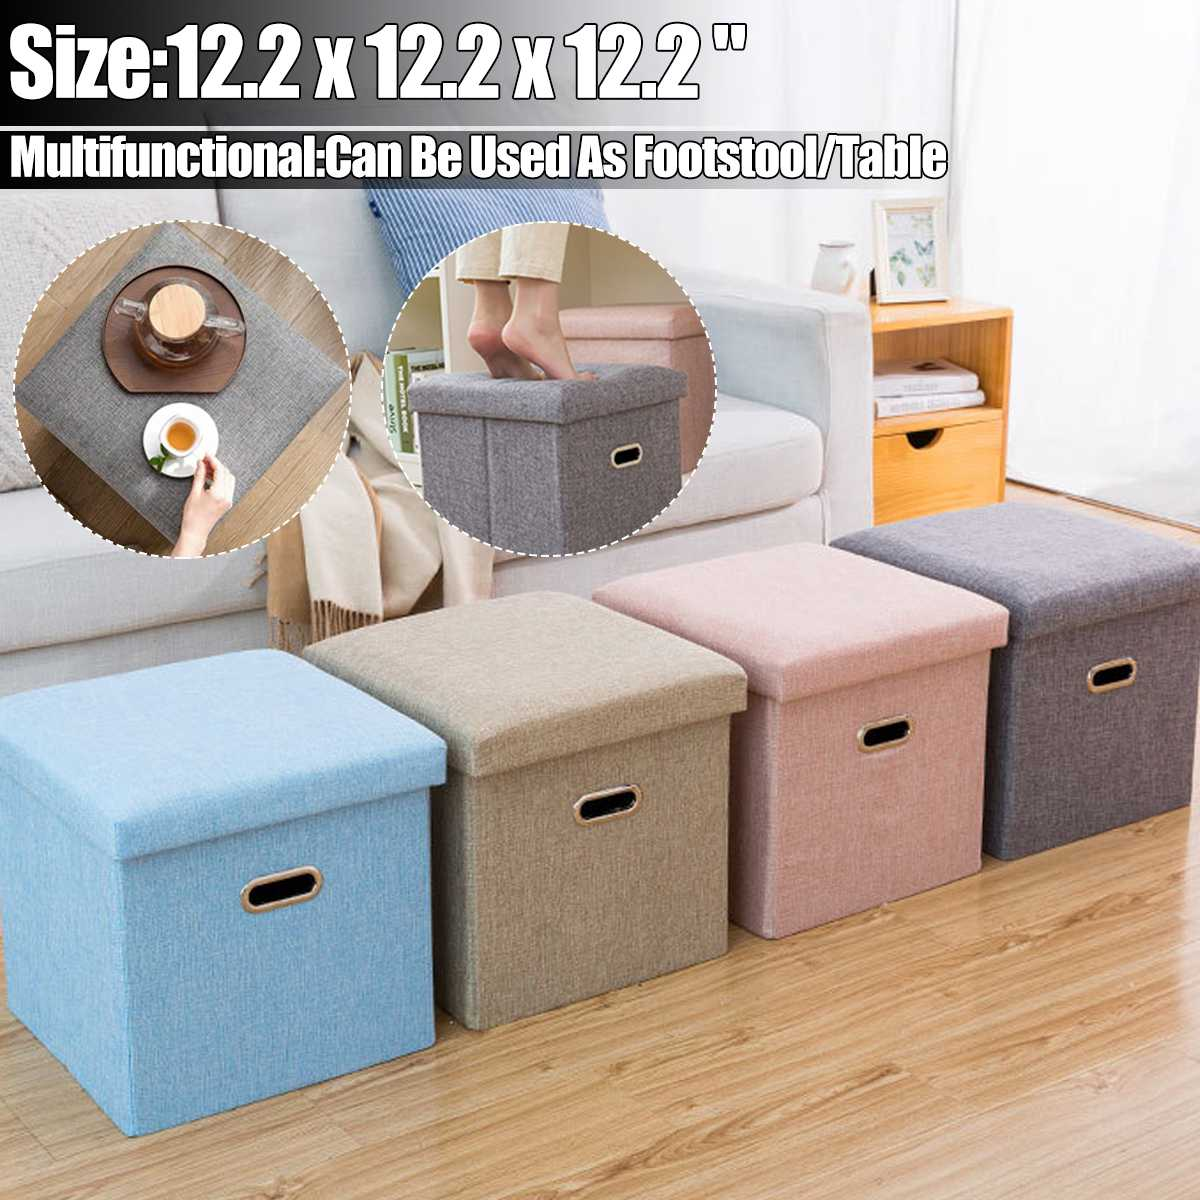 ¡Oferta! Taburete de almacenamiento de tela plegable multifuncional, caja de banco, pequeño sofá, estilo minimalista artístico, silla para niños, taburete de pie 31x31x31cm